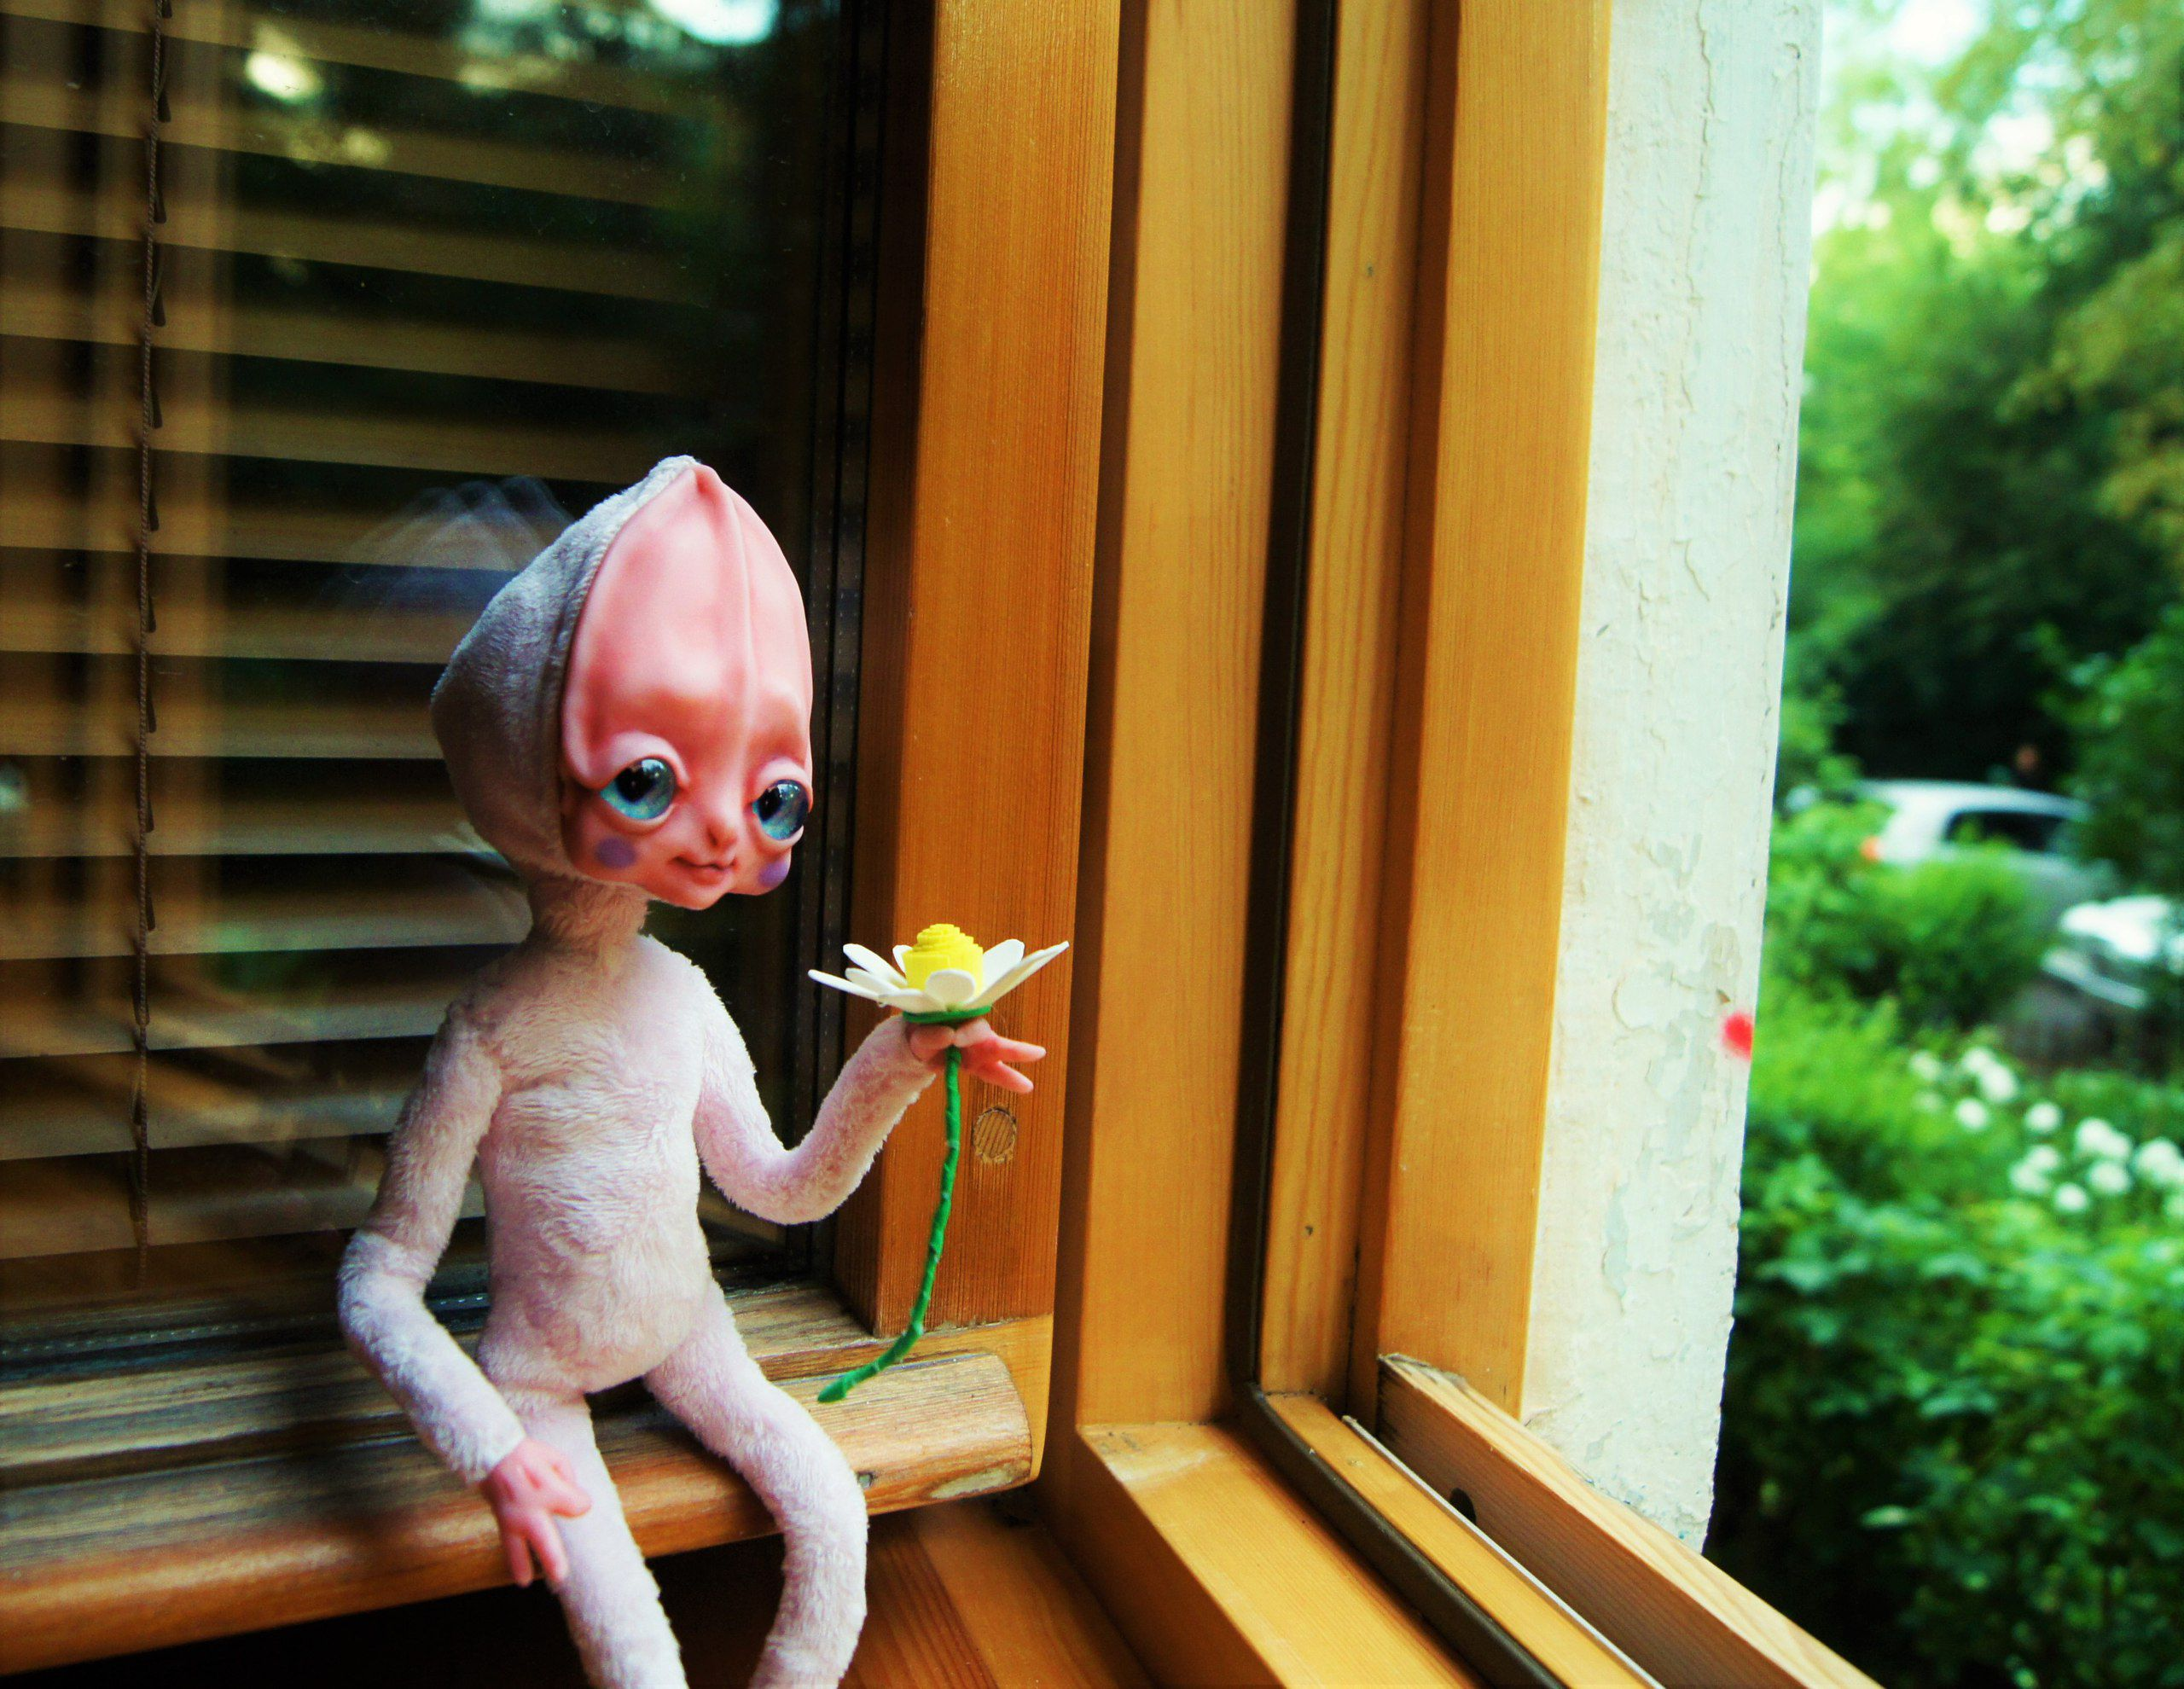 инопланетянка каркасная интерьерная кукла ручнаяработа пришелец